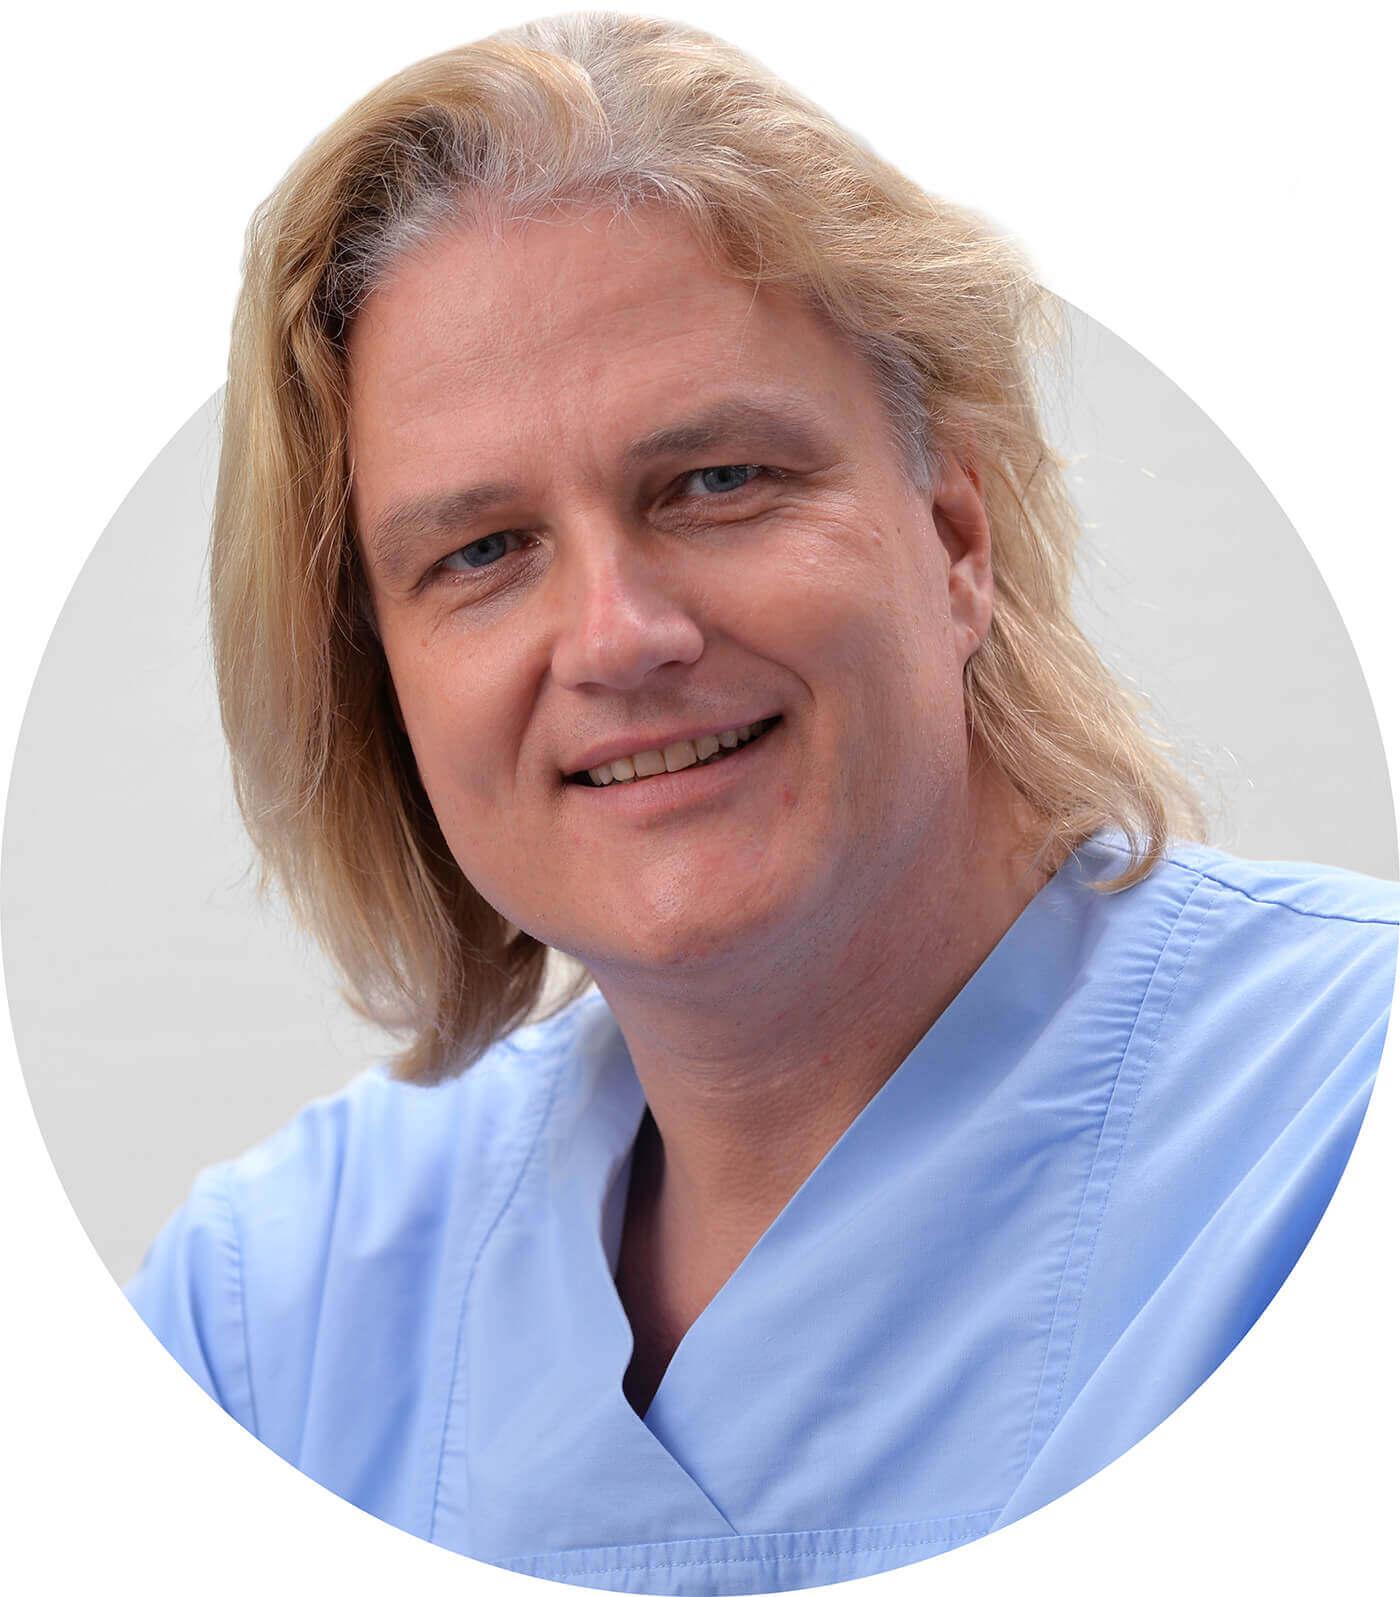 Zahnarzt Dr. Frank Seidel